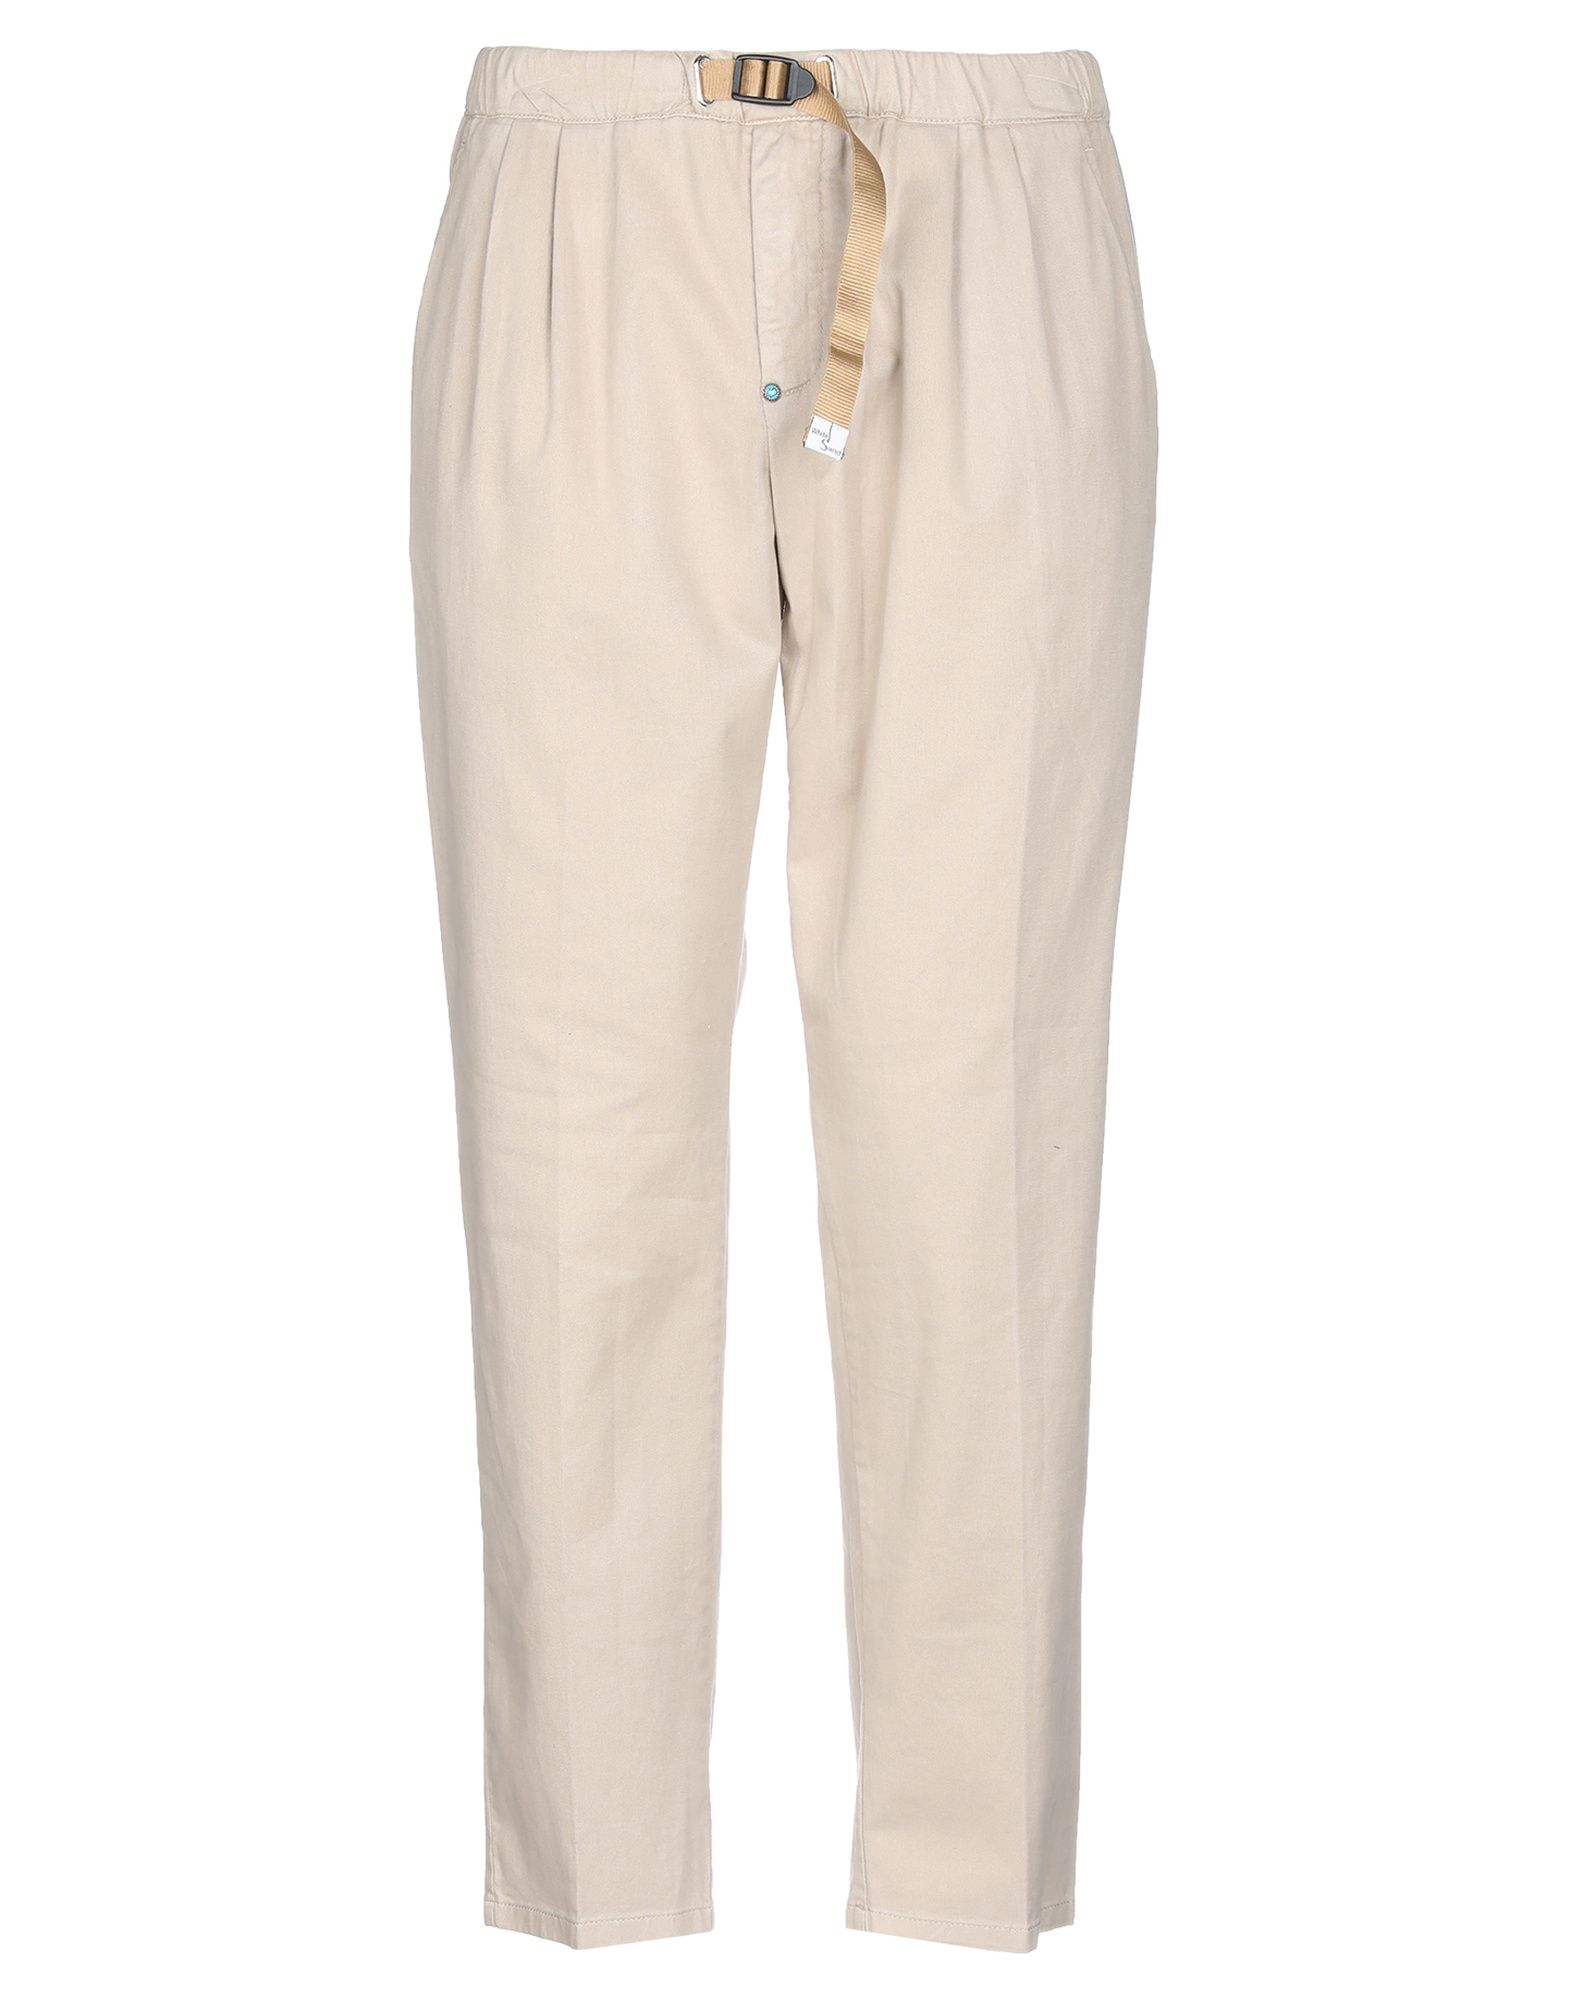 WHITE SAND 88 Повседневные брюки sand bag profi fit 20 кг